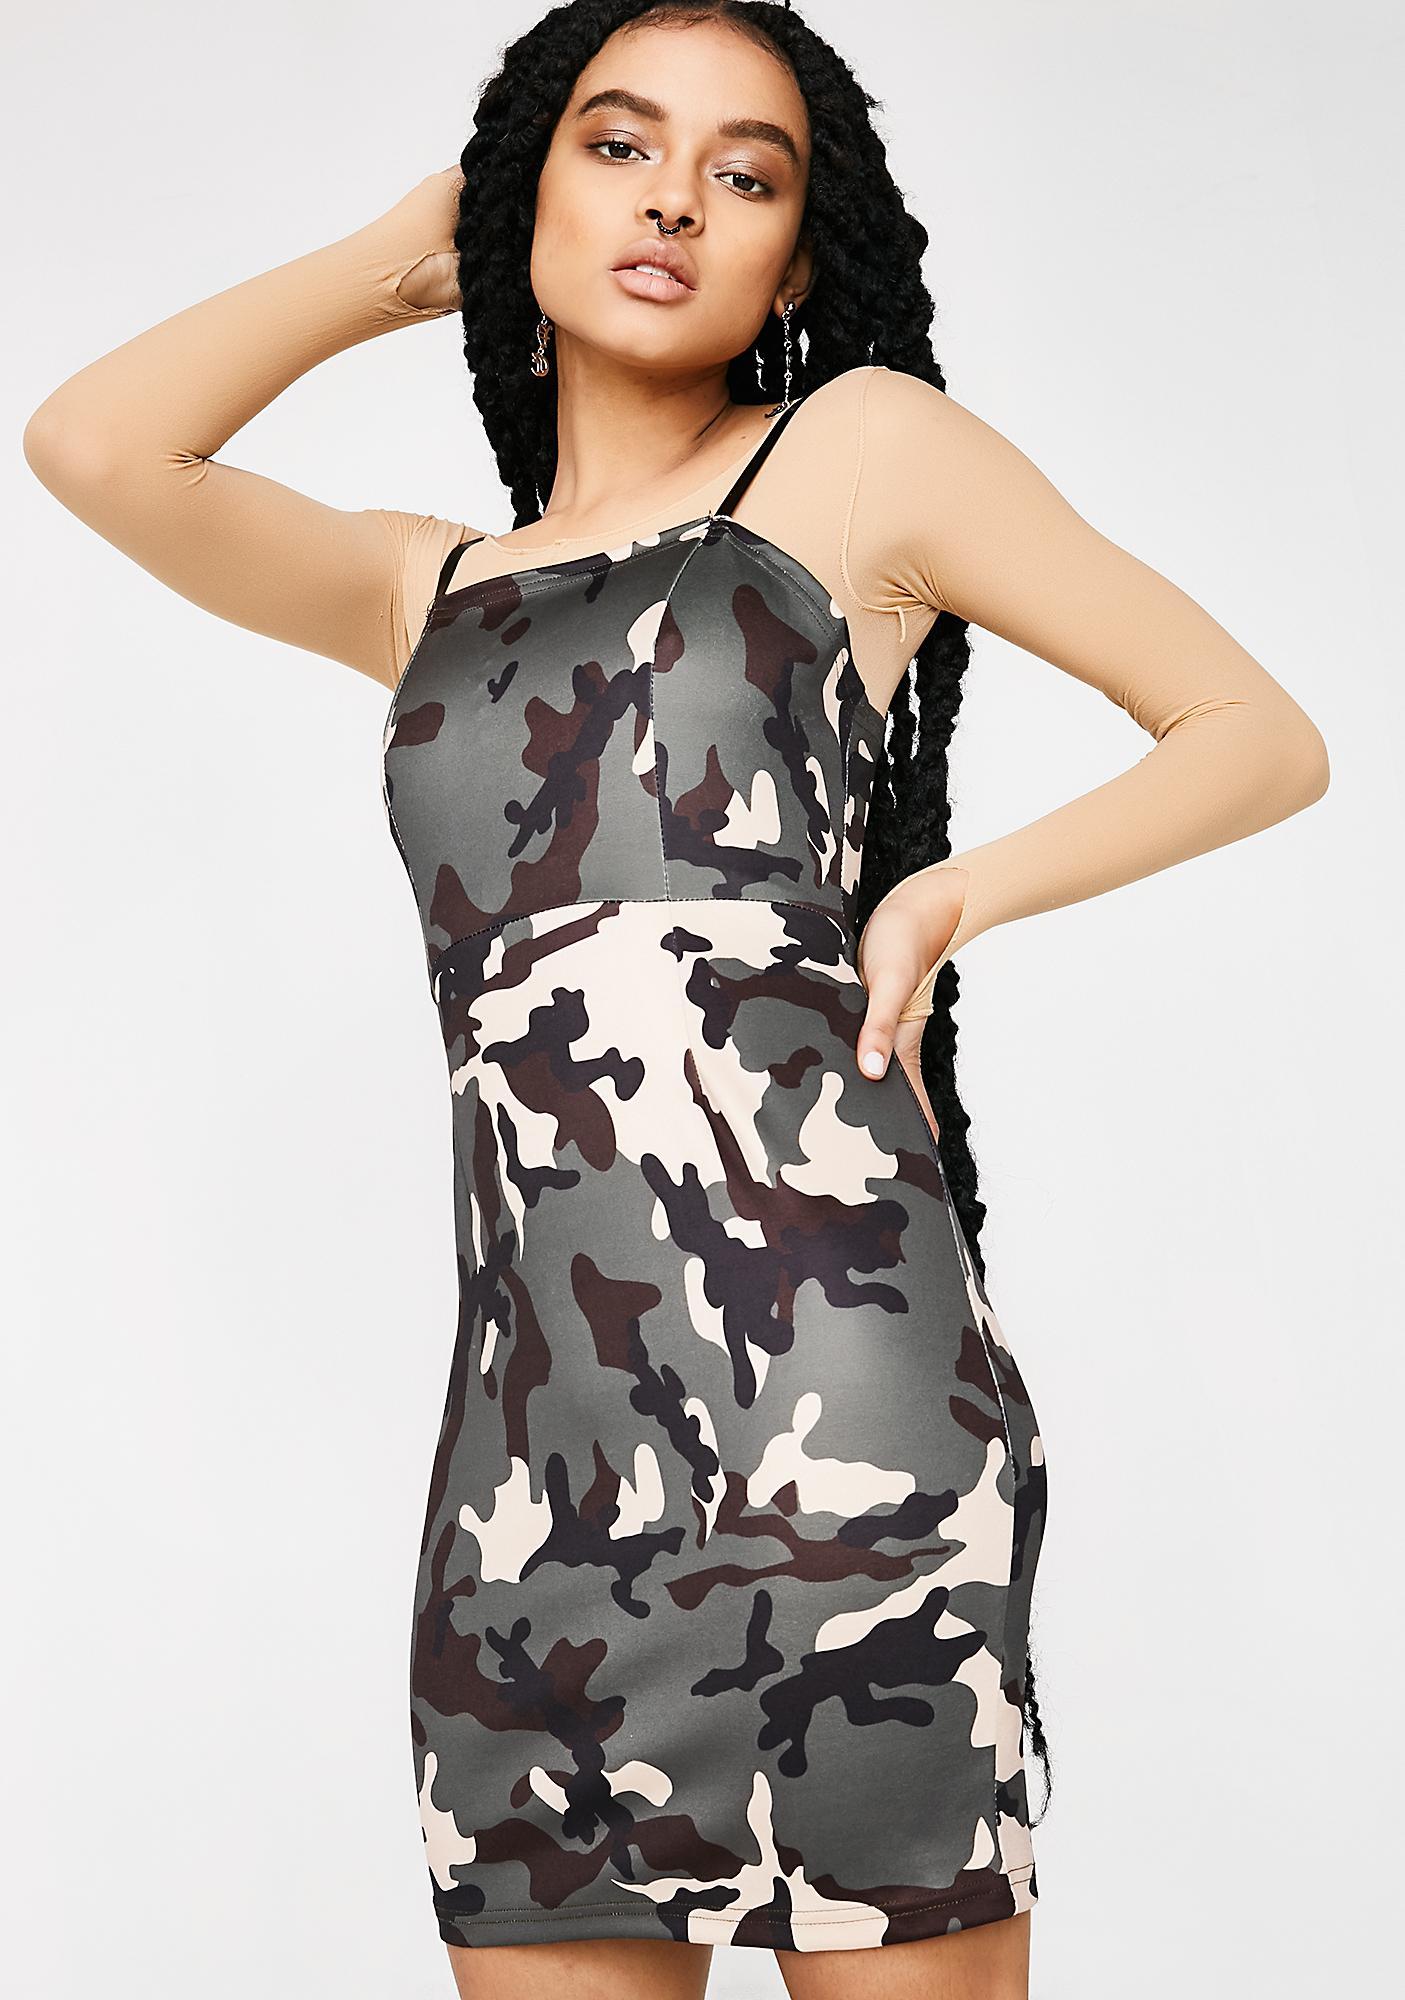 Poster Grl Sassy Squadron Camo Dress